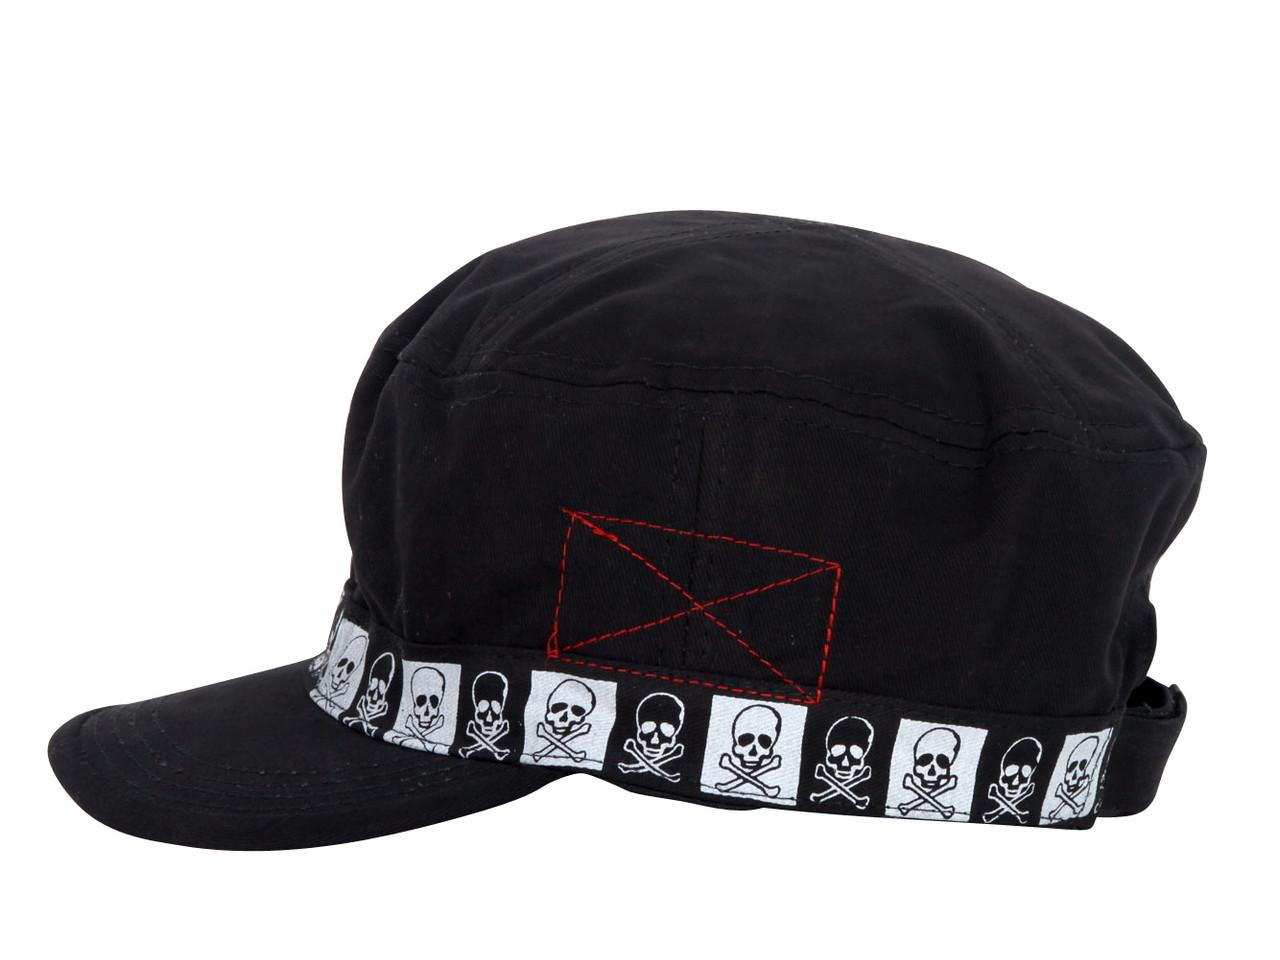 Checkered Skulls Black Cadet Cap - Gravity Trading de3165c00853